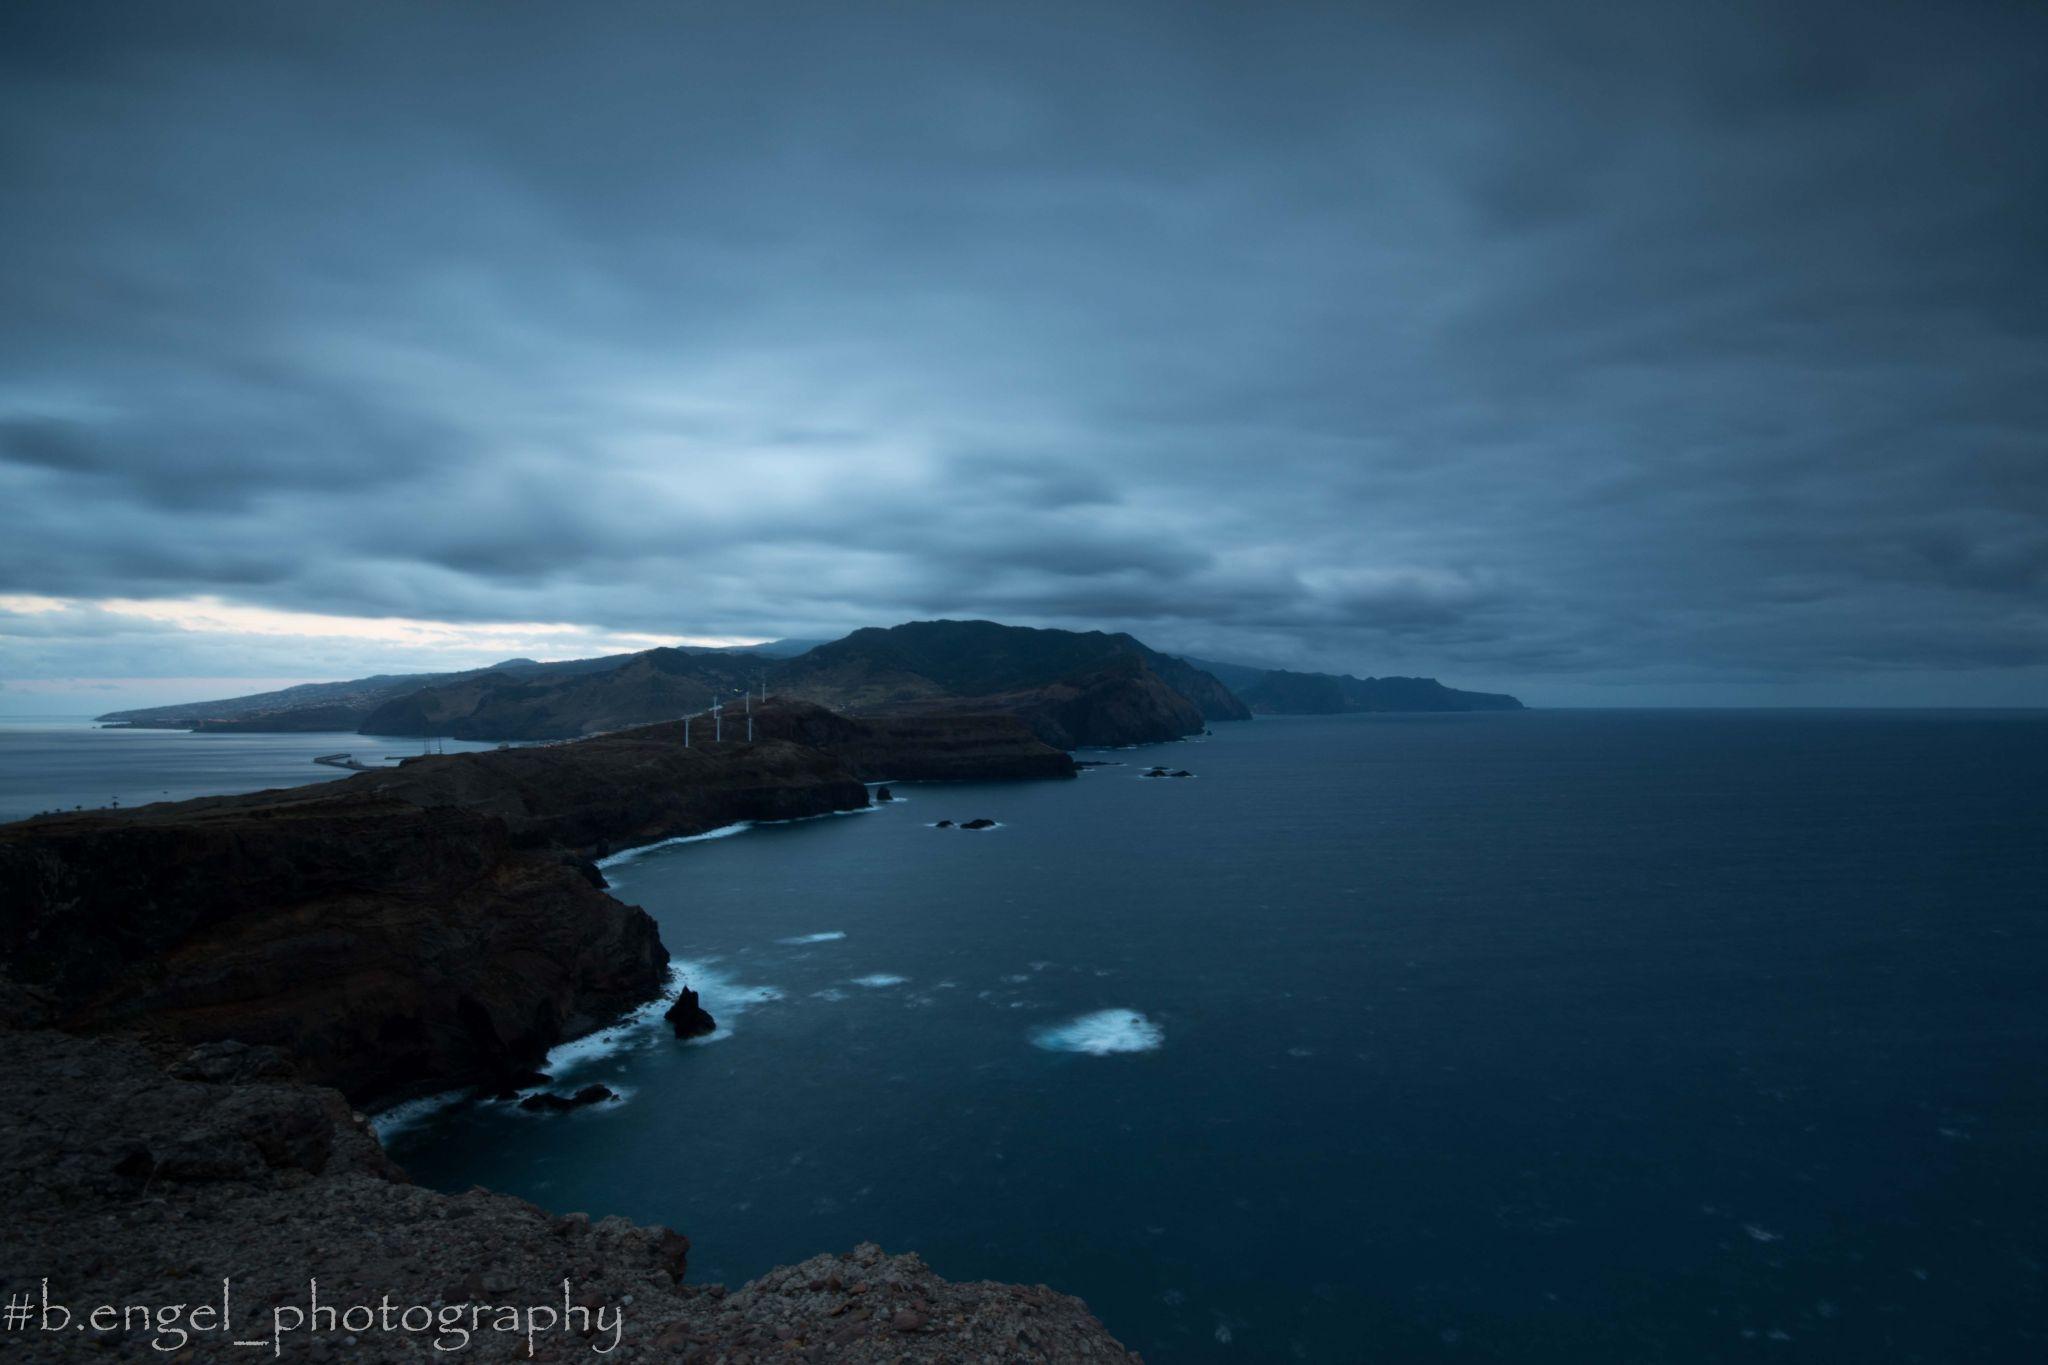 View Madeira Island, Portugal